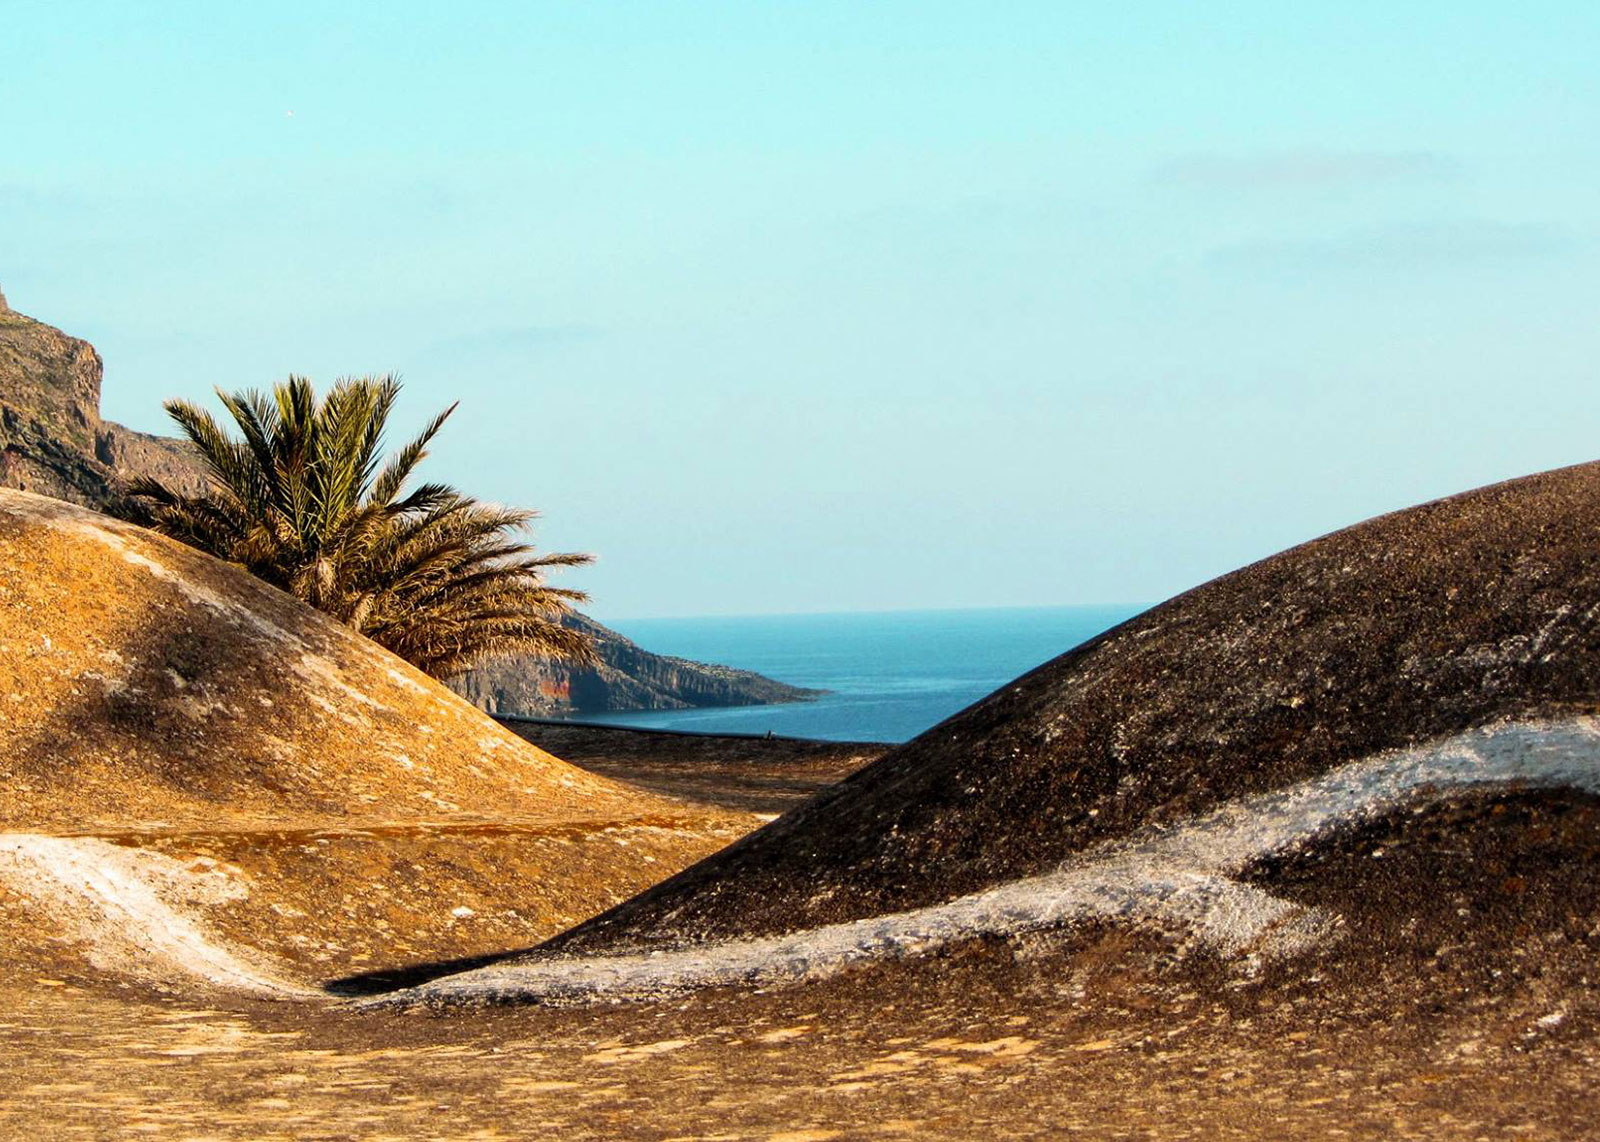 Dammusi-Uliveto-Pantelleria-Storia